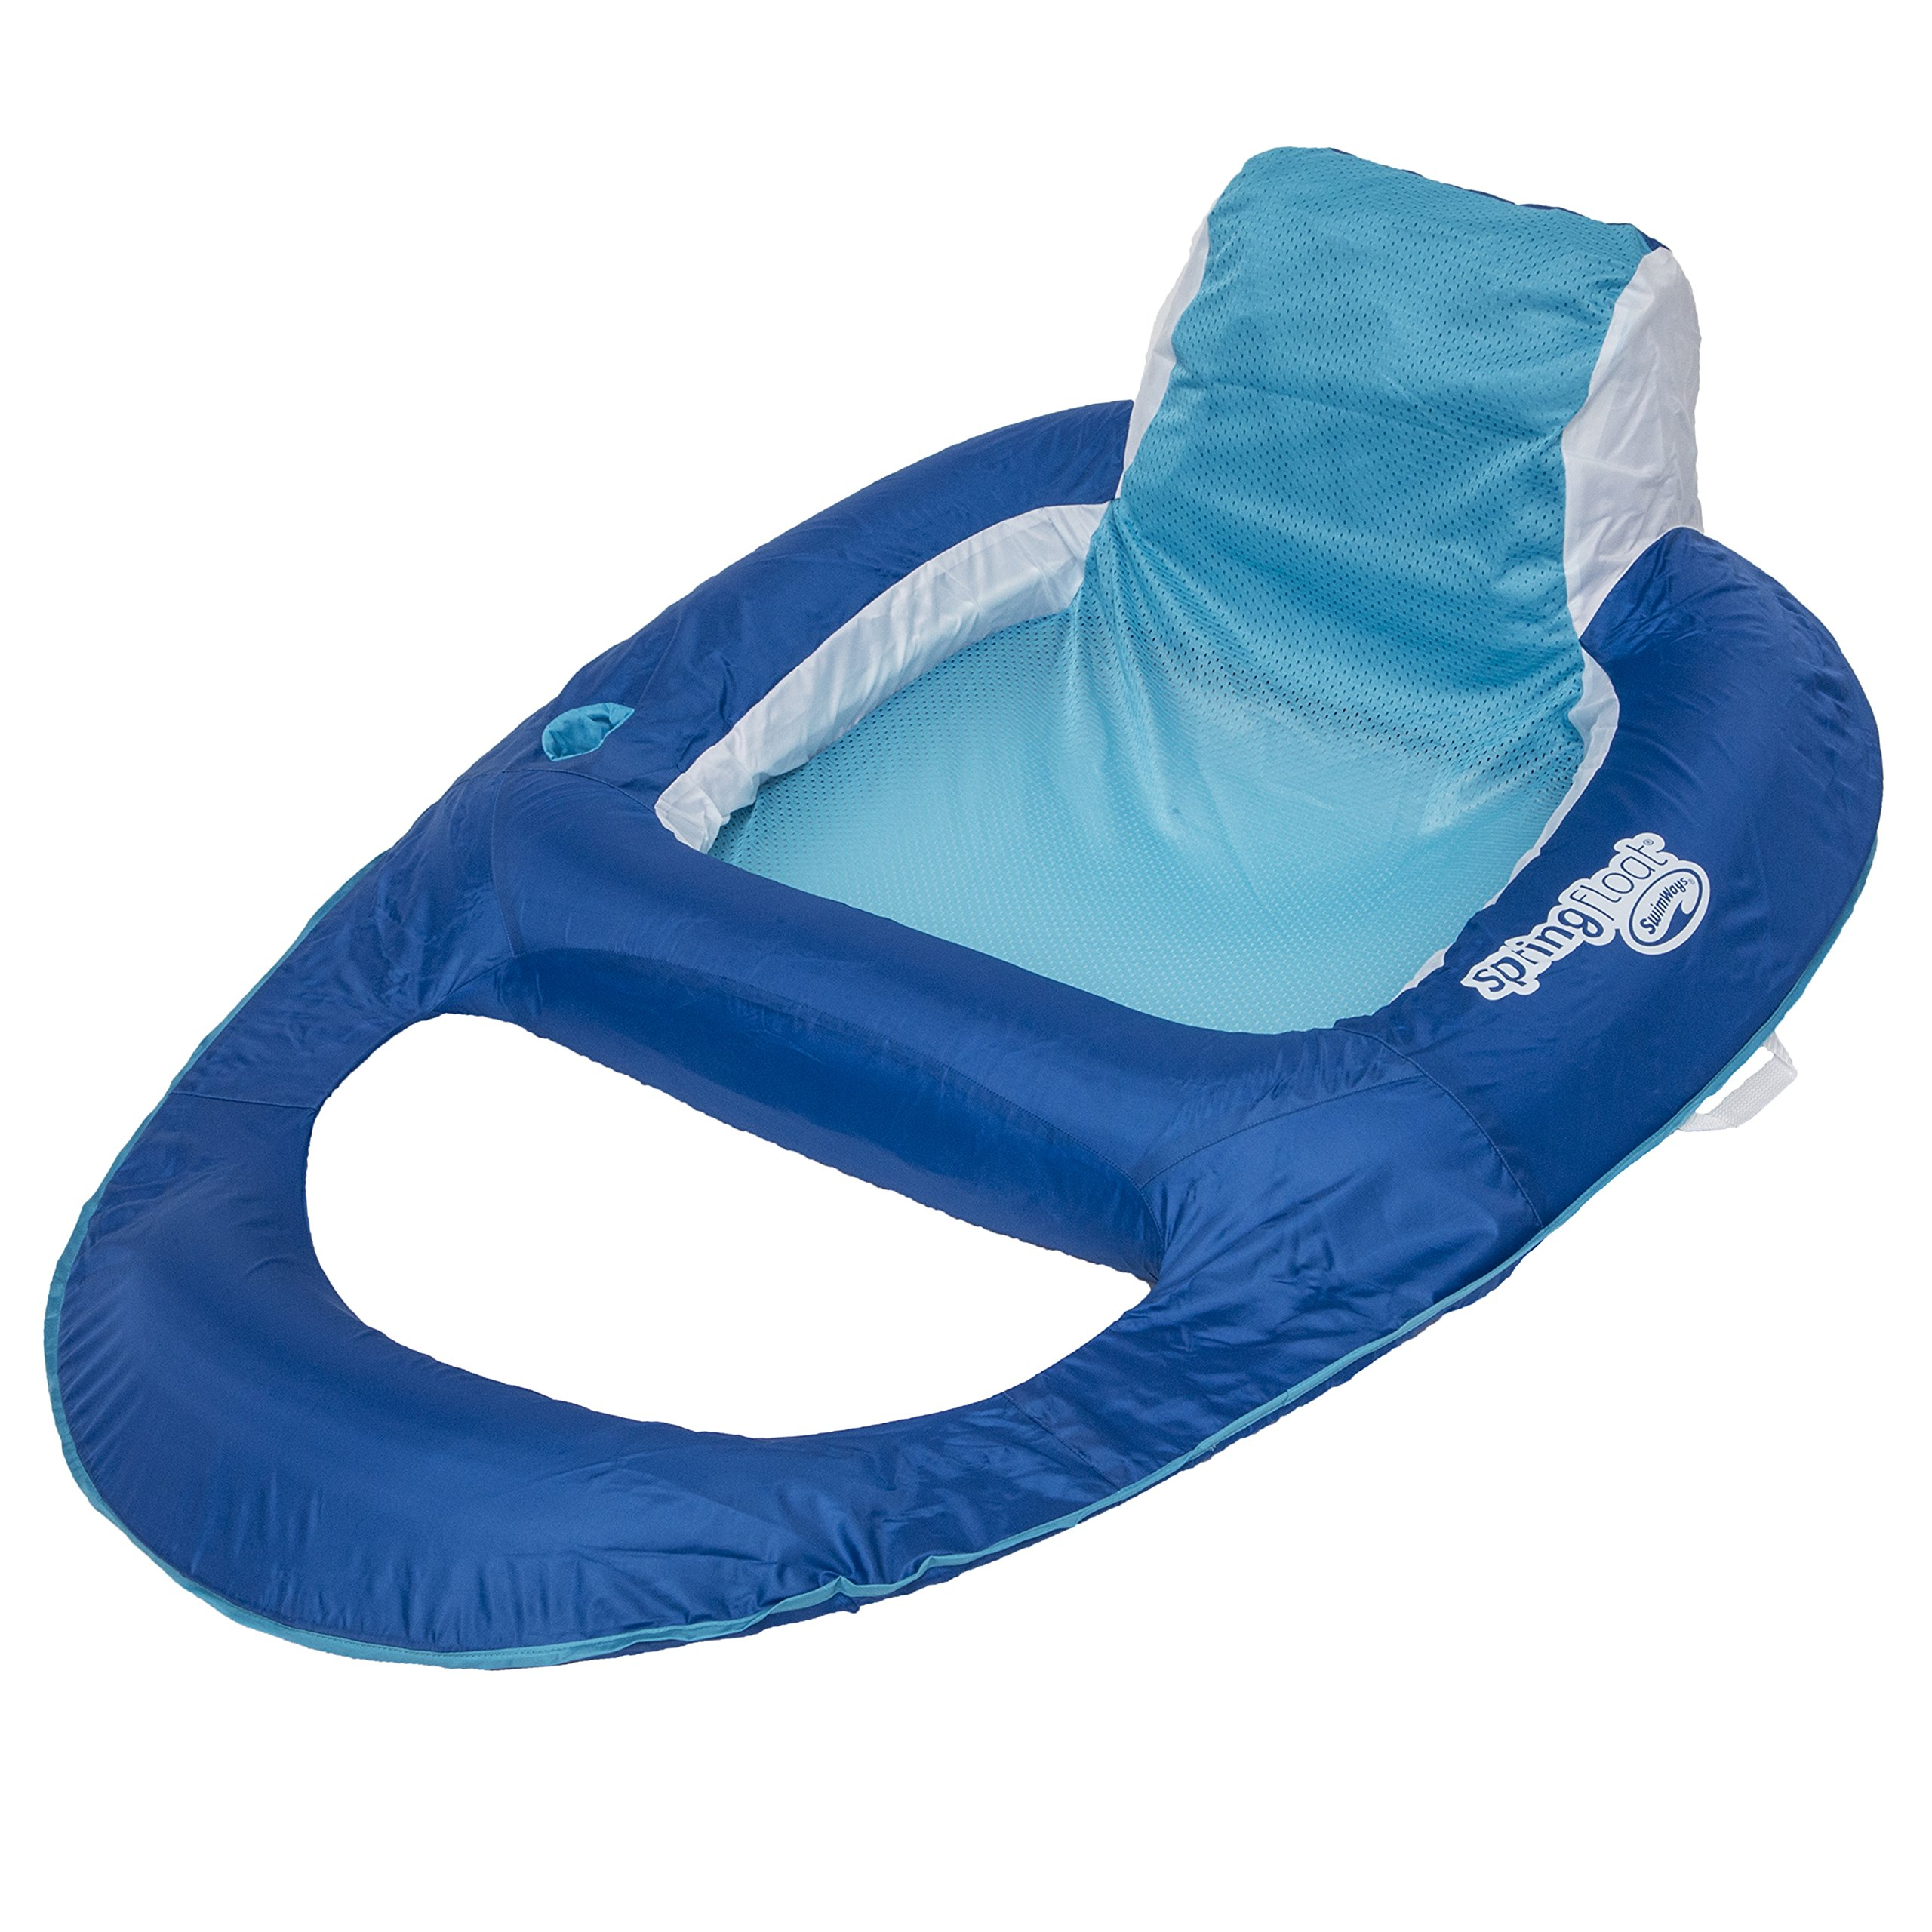 SwimWays Spring Float Recliner - Swim Lounger for Pool or Lake - Dark Blue/Light Blue by SwimWays